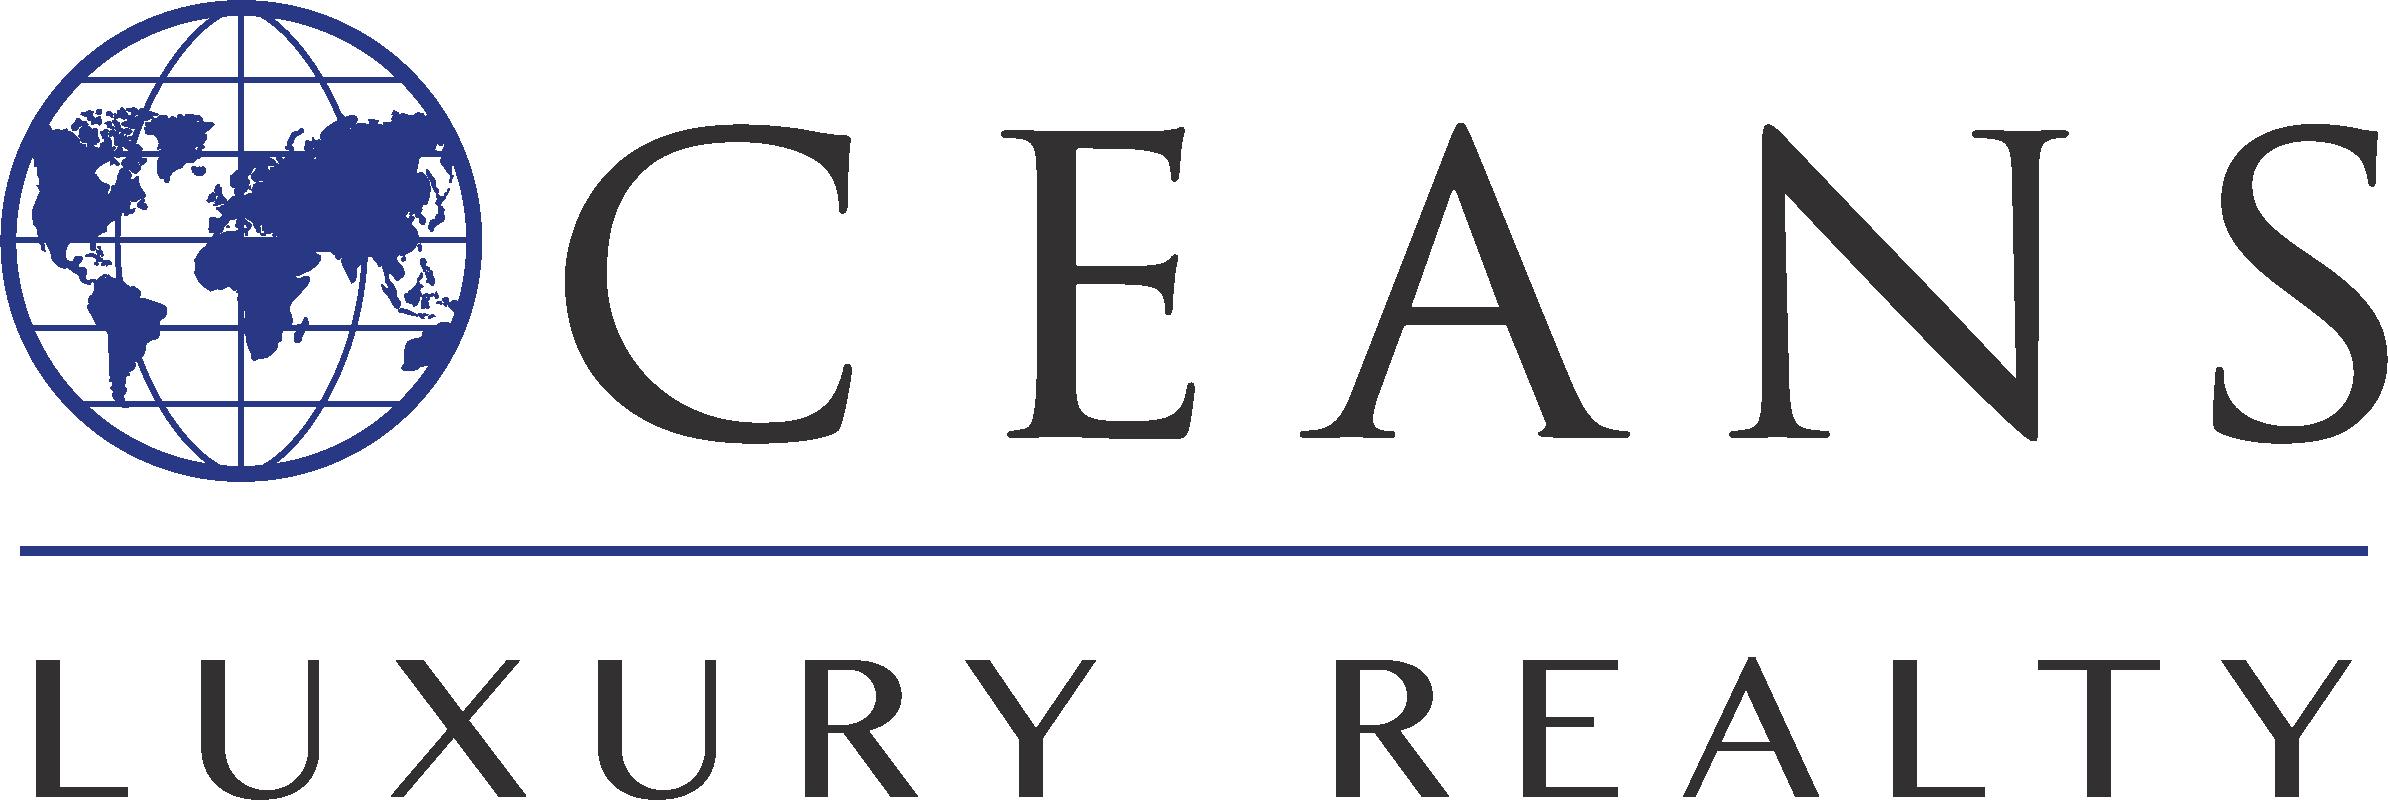 Oceans Luxury Realty Full Service LLC